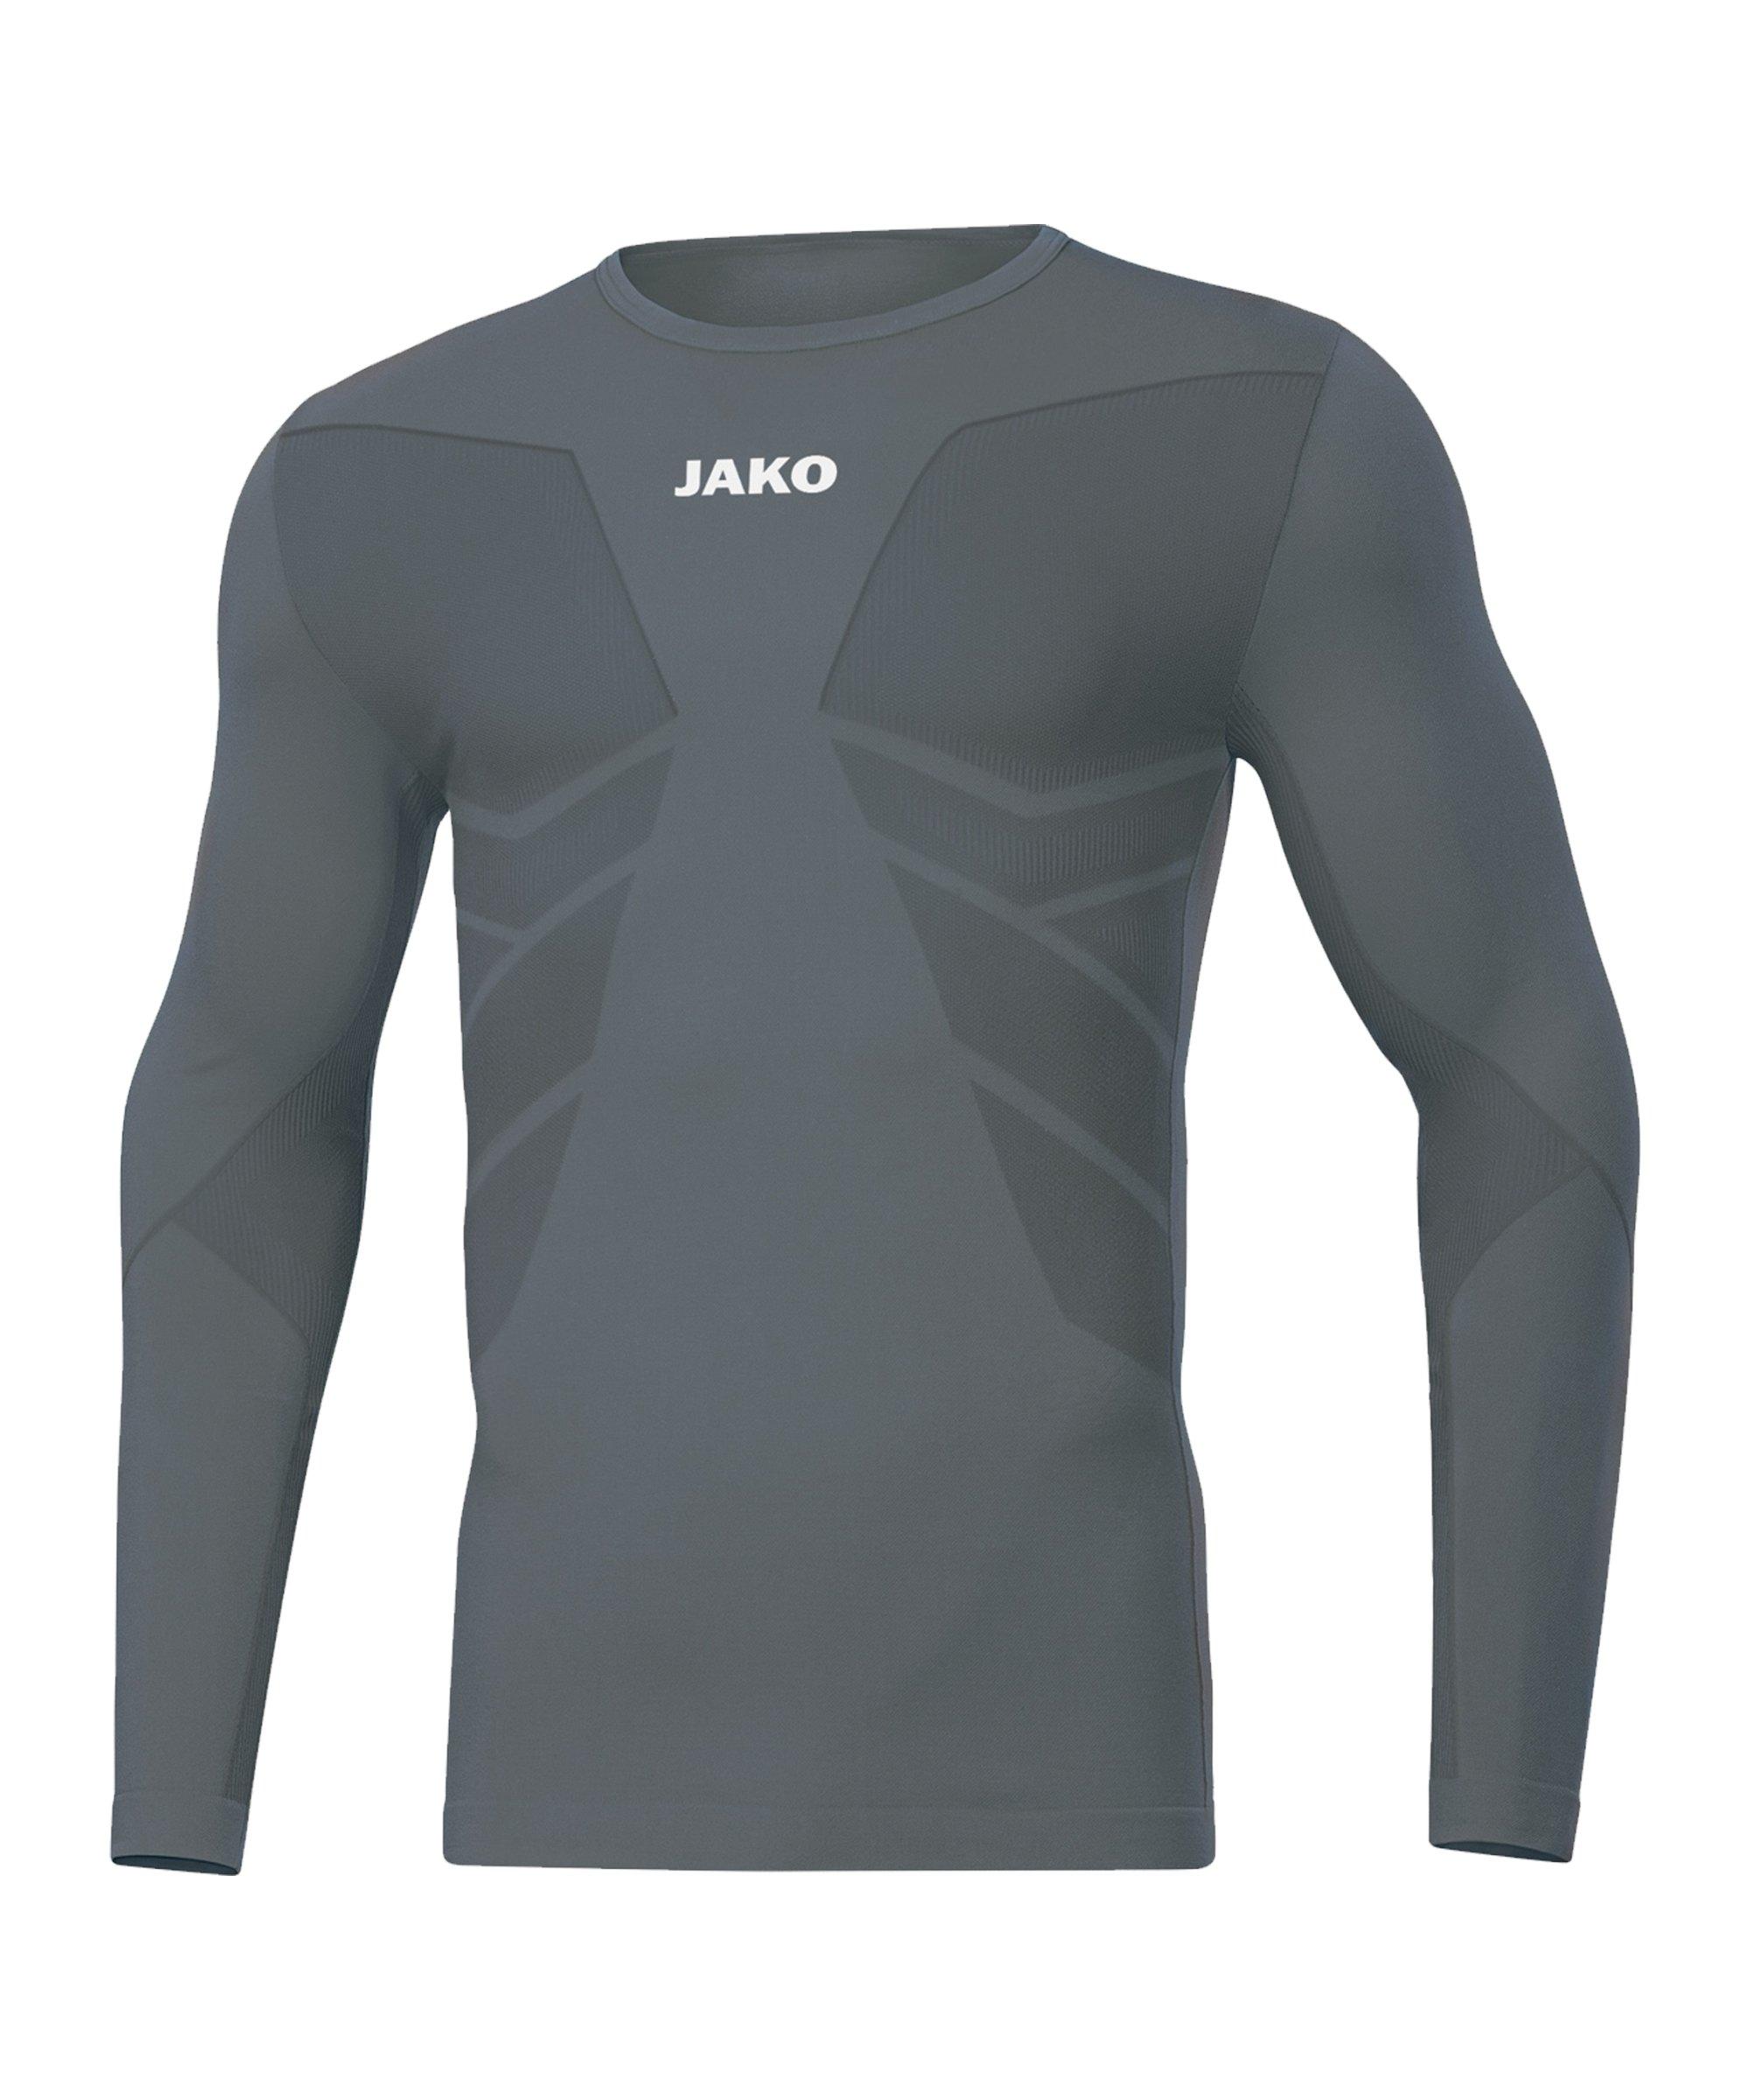 JAKO Comfort 2.0 langarm Grau F40 - grau